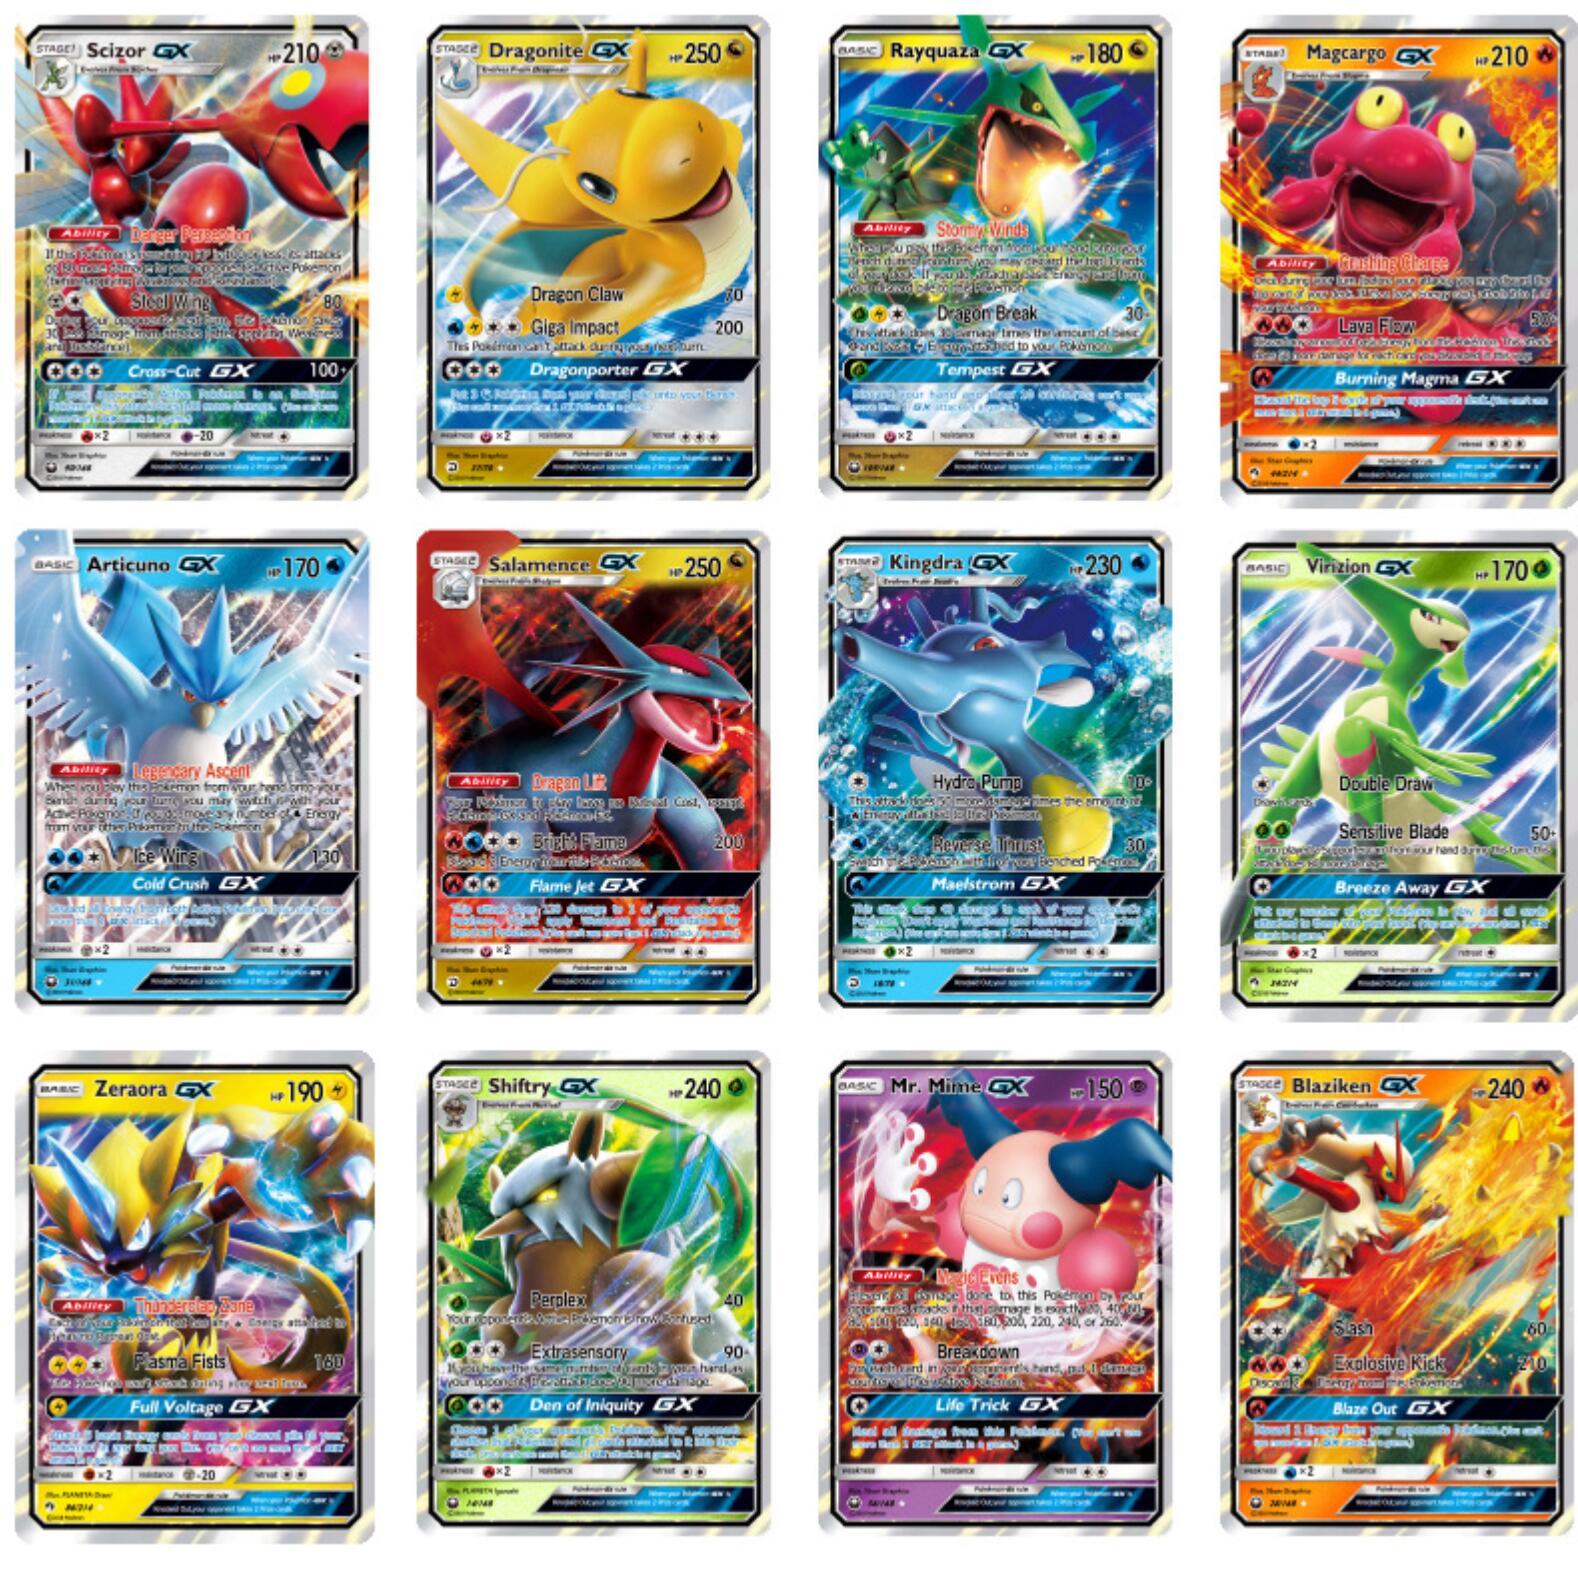 200 Pcs 25 50pcs GX MEGA Shining Cards Game Battle Carte 100pcs Trading Cards Game Children Toy(China)